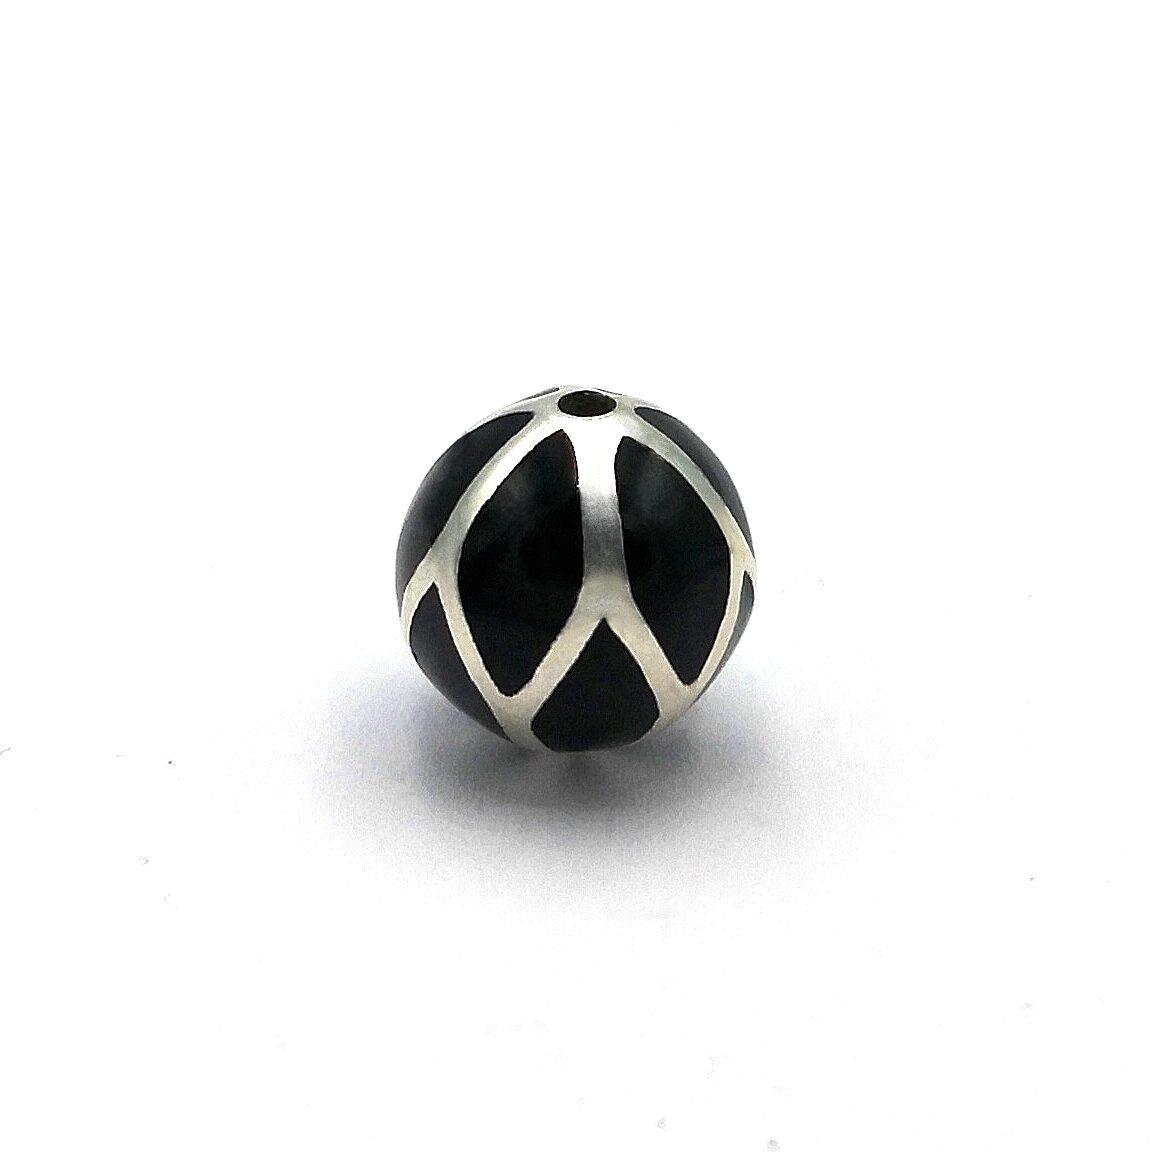 12 mm Black Enamel Plated 925 Sterling Silver Bali Bead